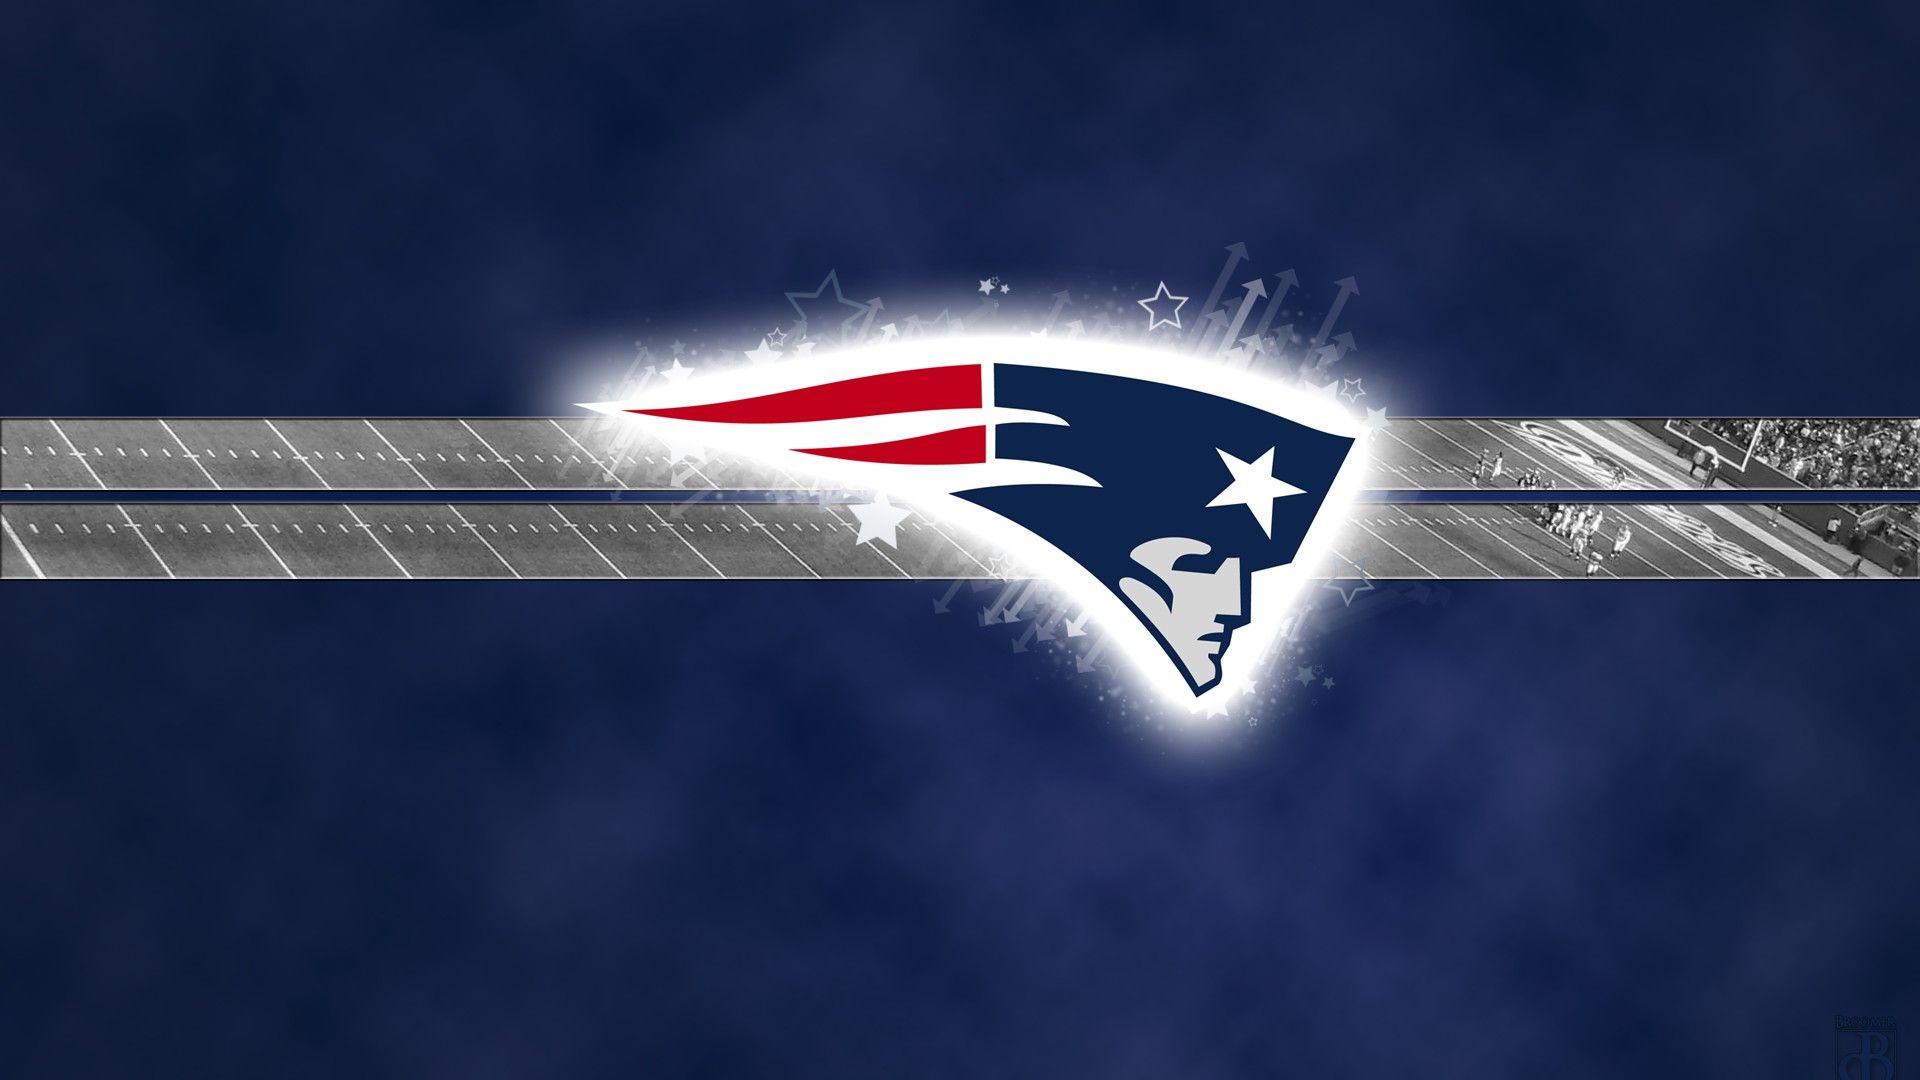 Hd Ne Patriots Backgrounds 2020 Nfl Football Wallpapers New England Patriots Wallpaper New England Patriots Nfl New England Patriots